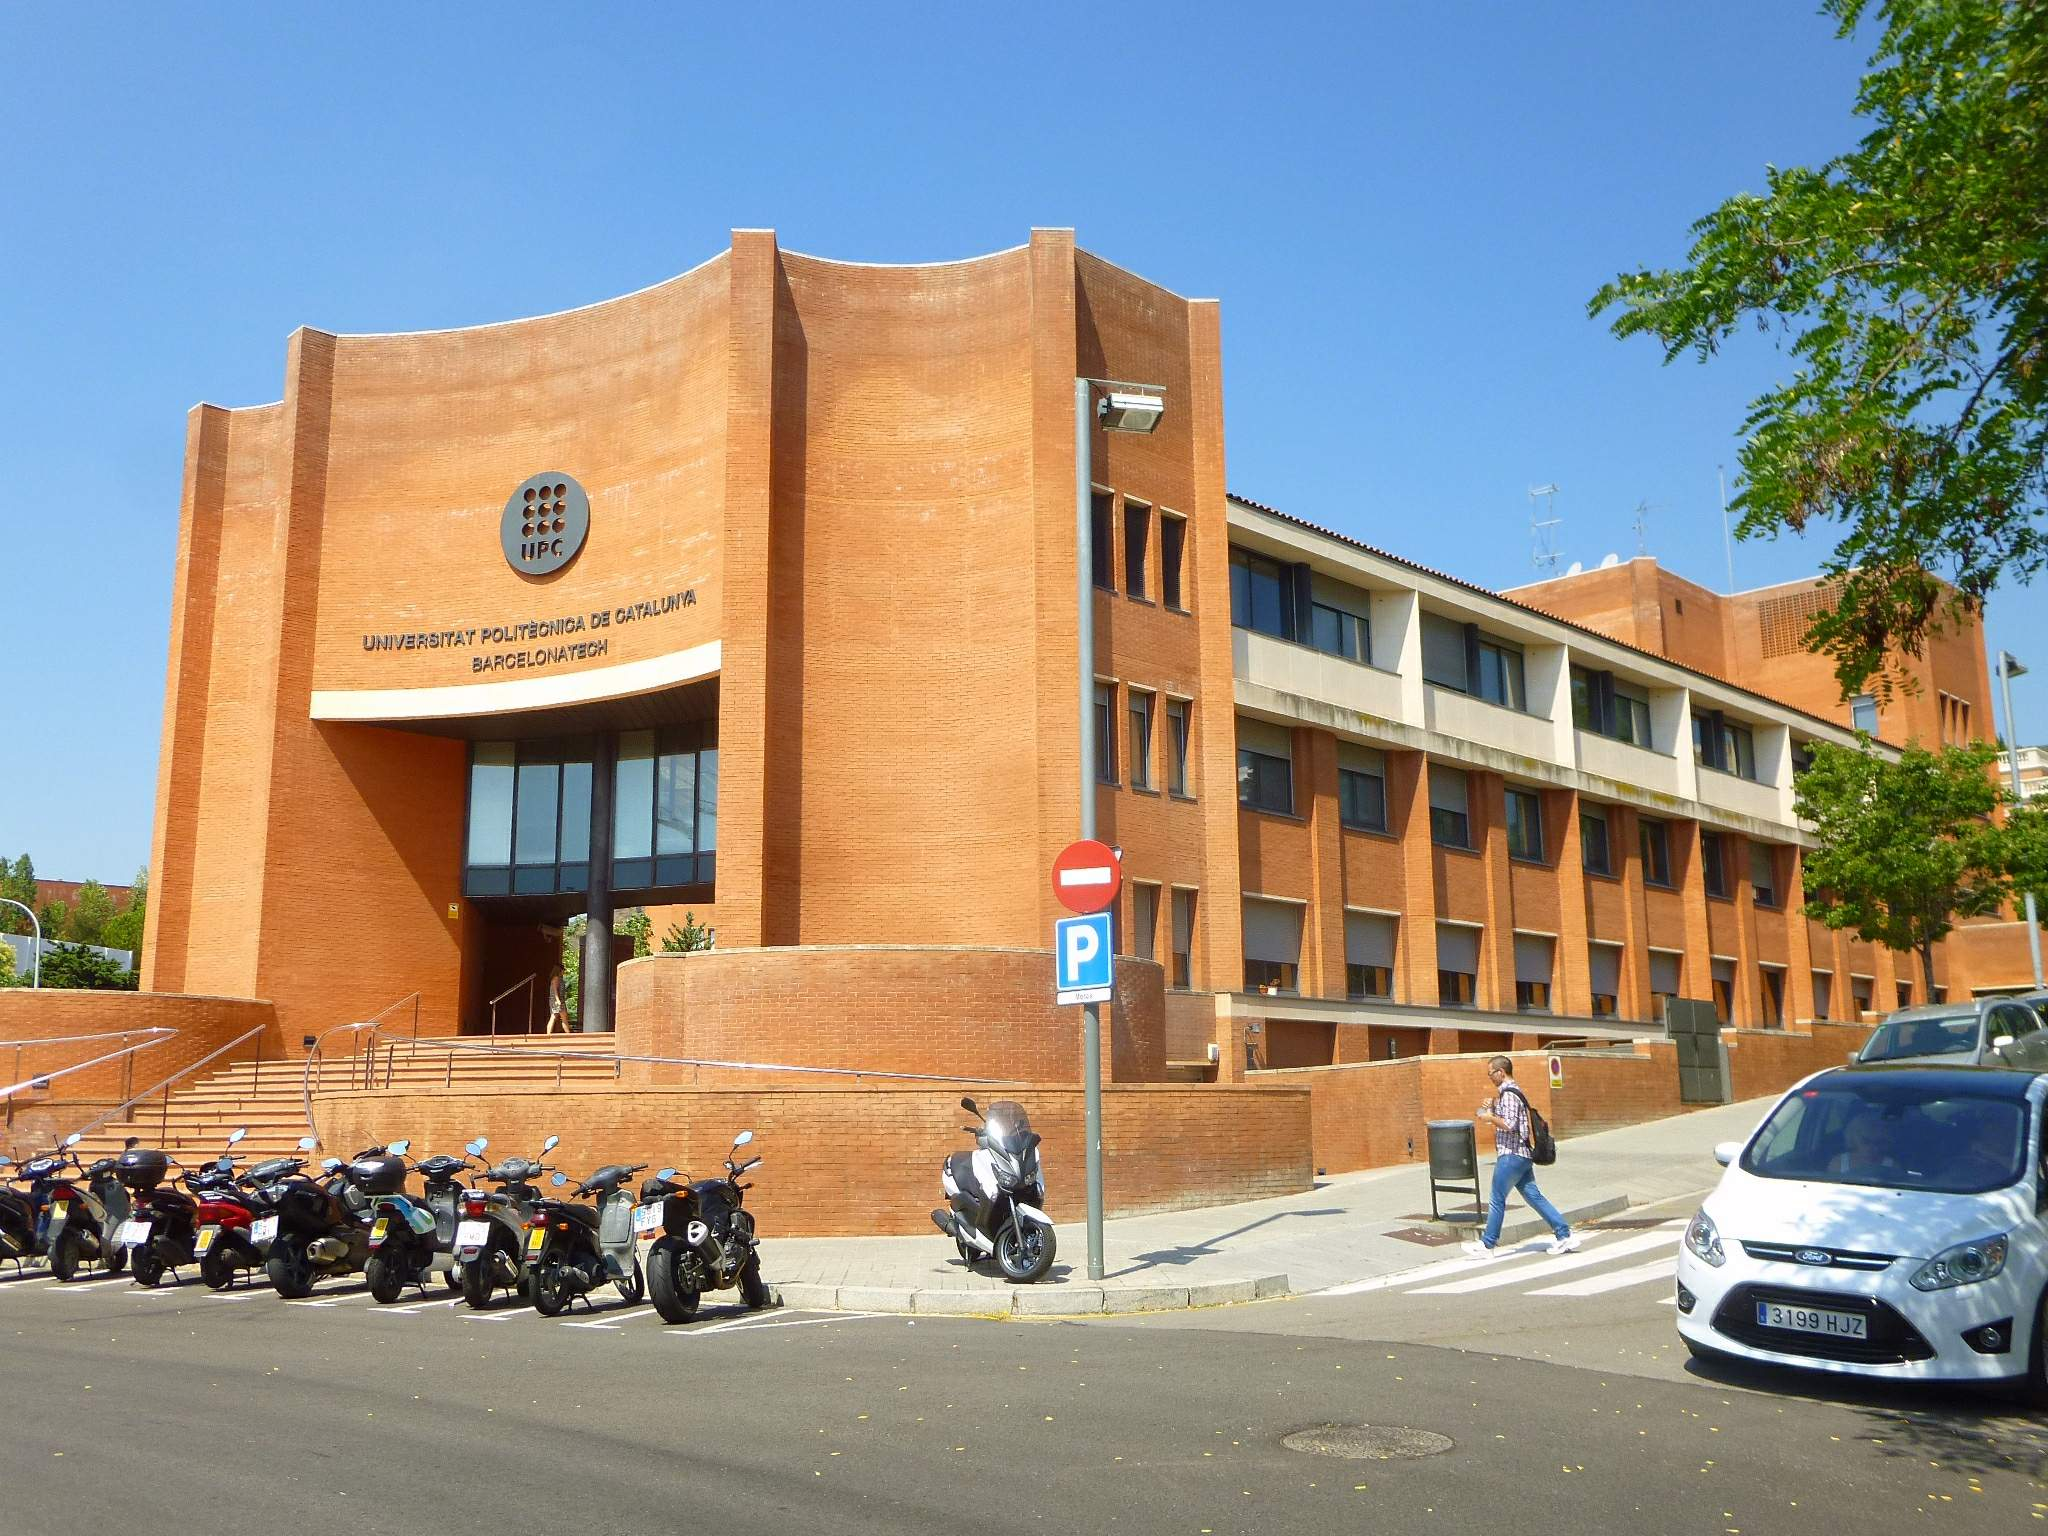 File:Barcelona - Universidad Politécnica de Cataluña (UPC) - Campus Norte -  Edificio Vèrtex 3.jpg - Wikimedia Commons